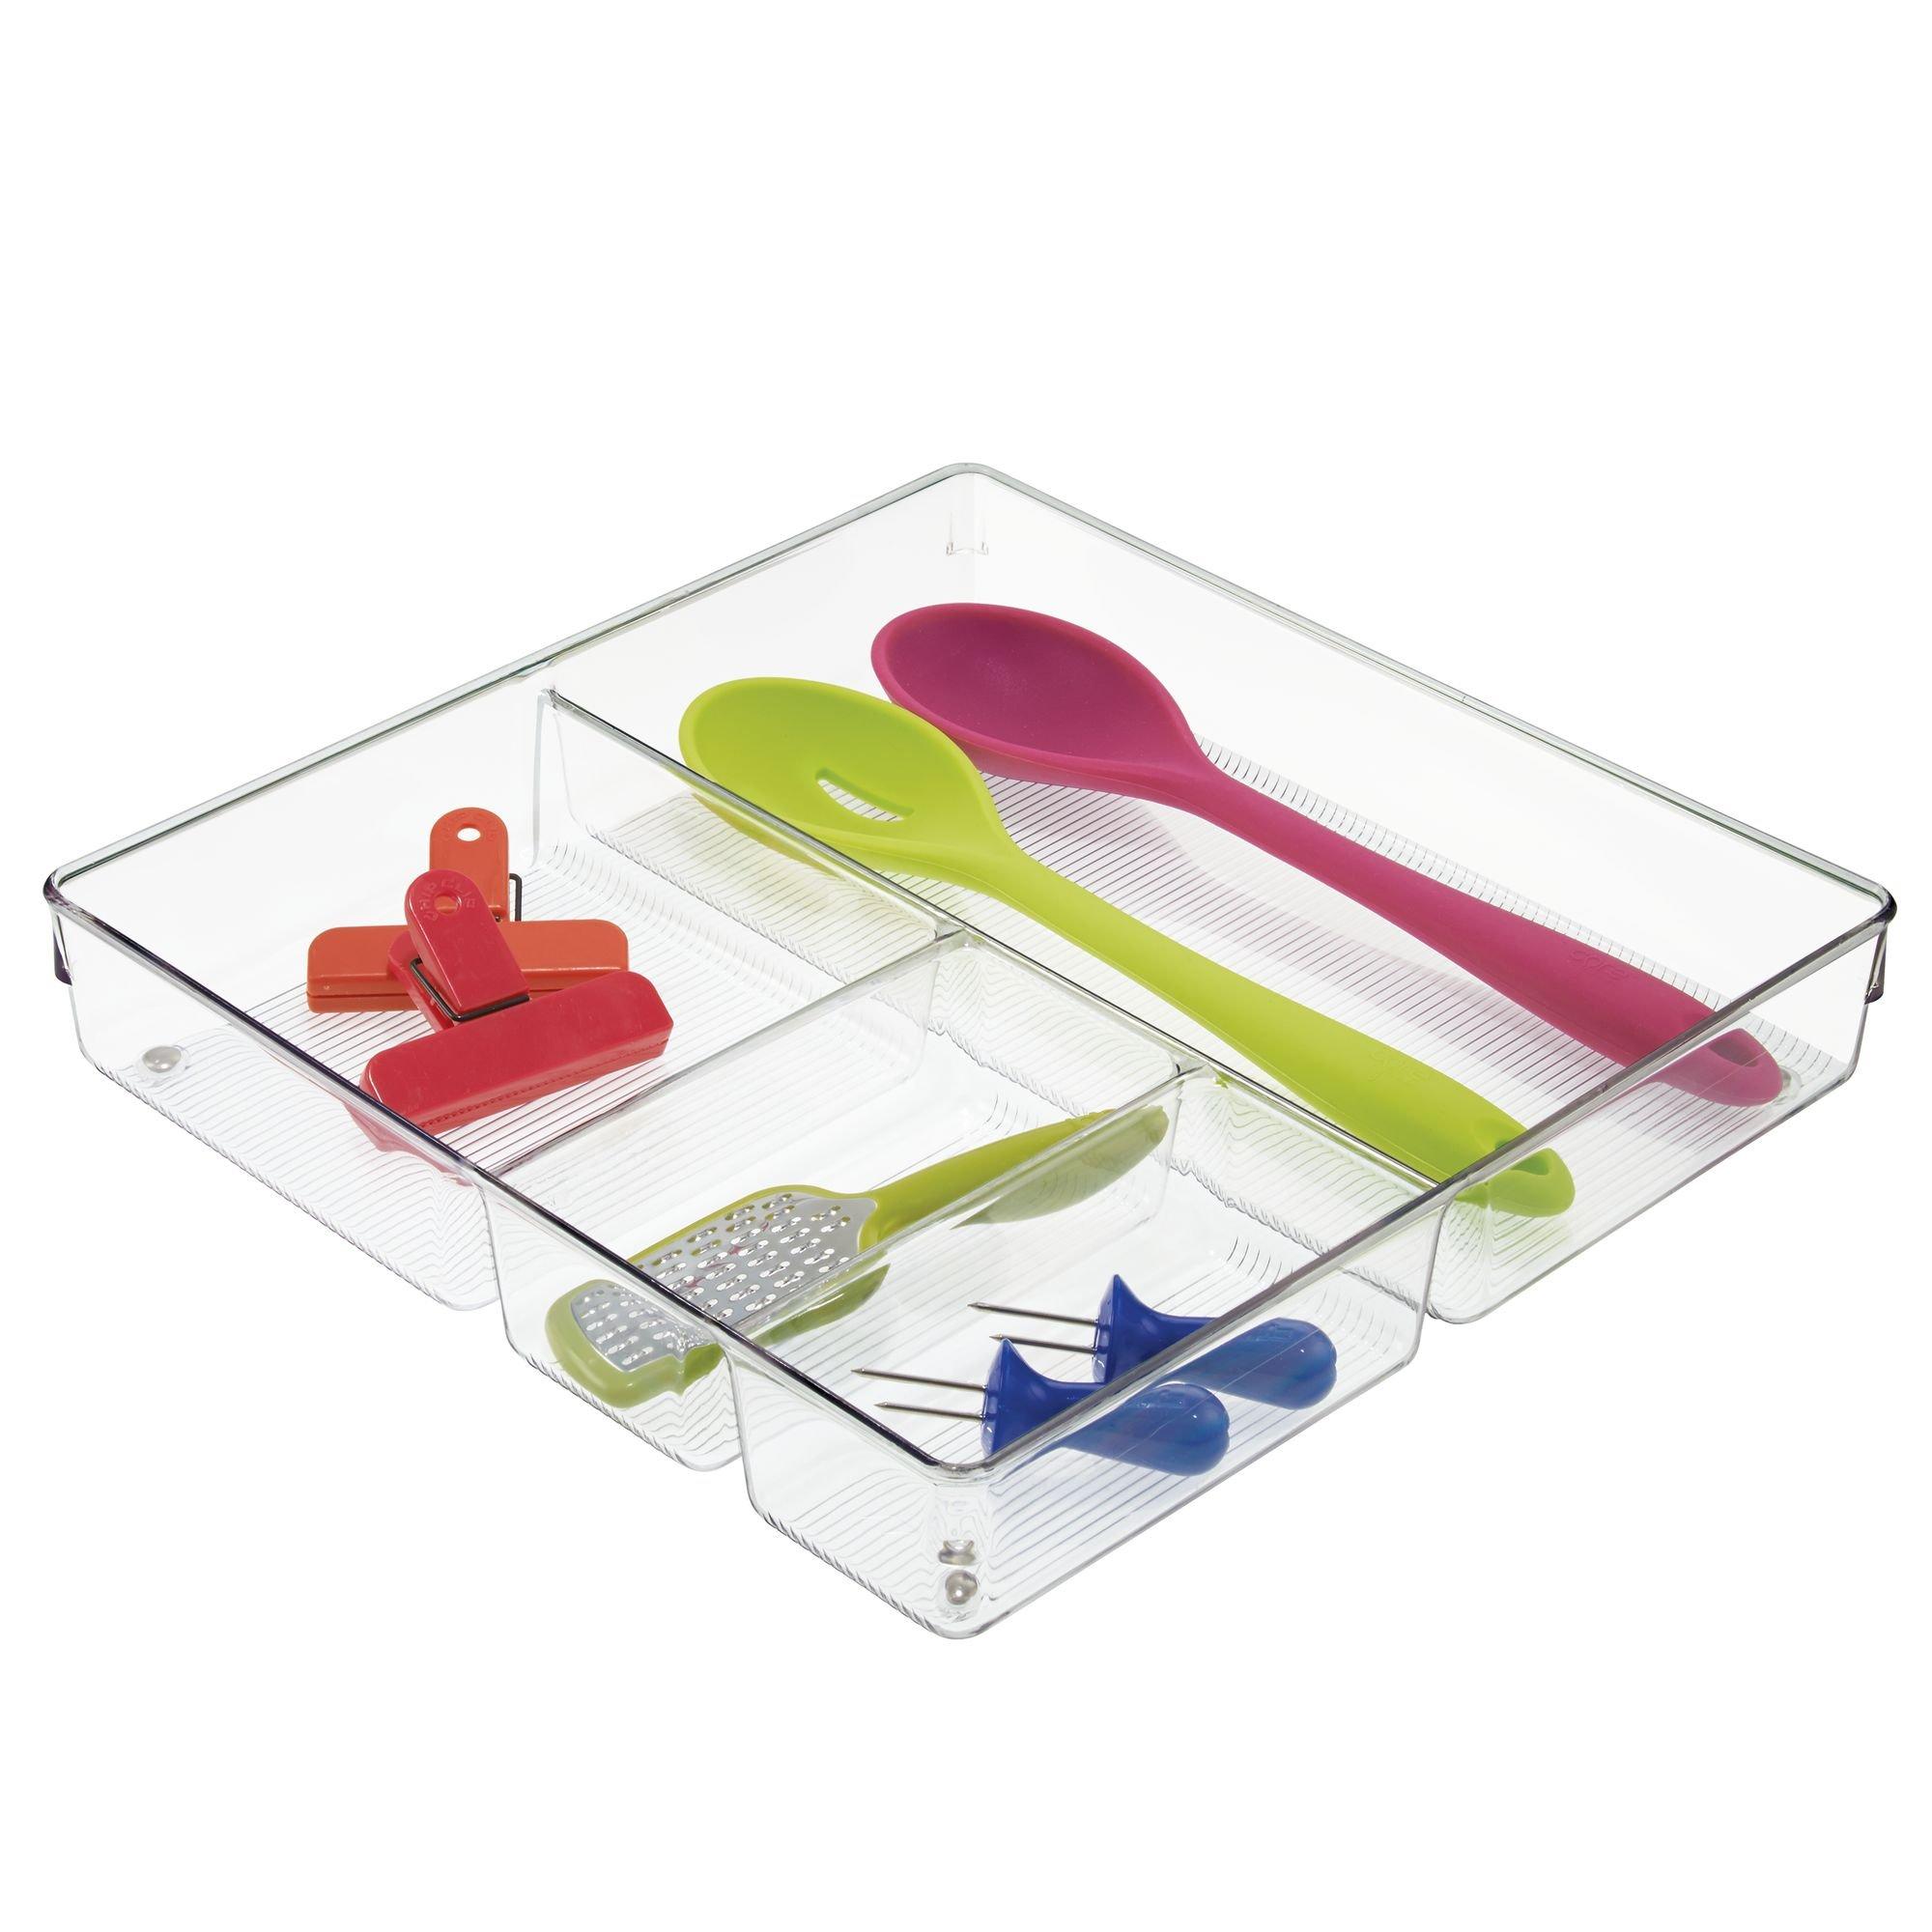 InterDesign Linus Plastic Grand Divided Organizer, Storage Container for Kitchen, Vanity, Bathroom Drawers, 12'' x 12'' x 2'' Clear by InterDesign (Image #4)